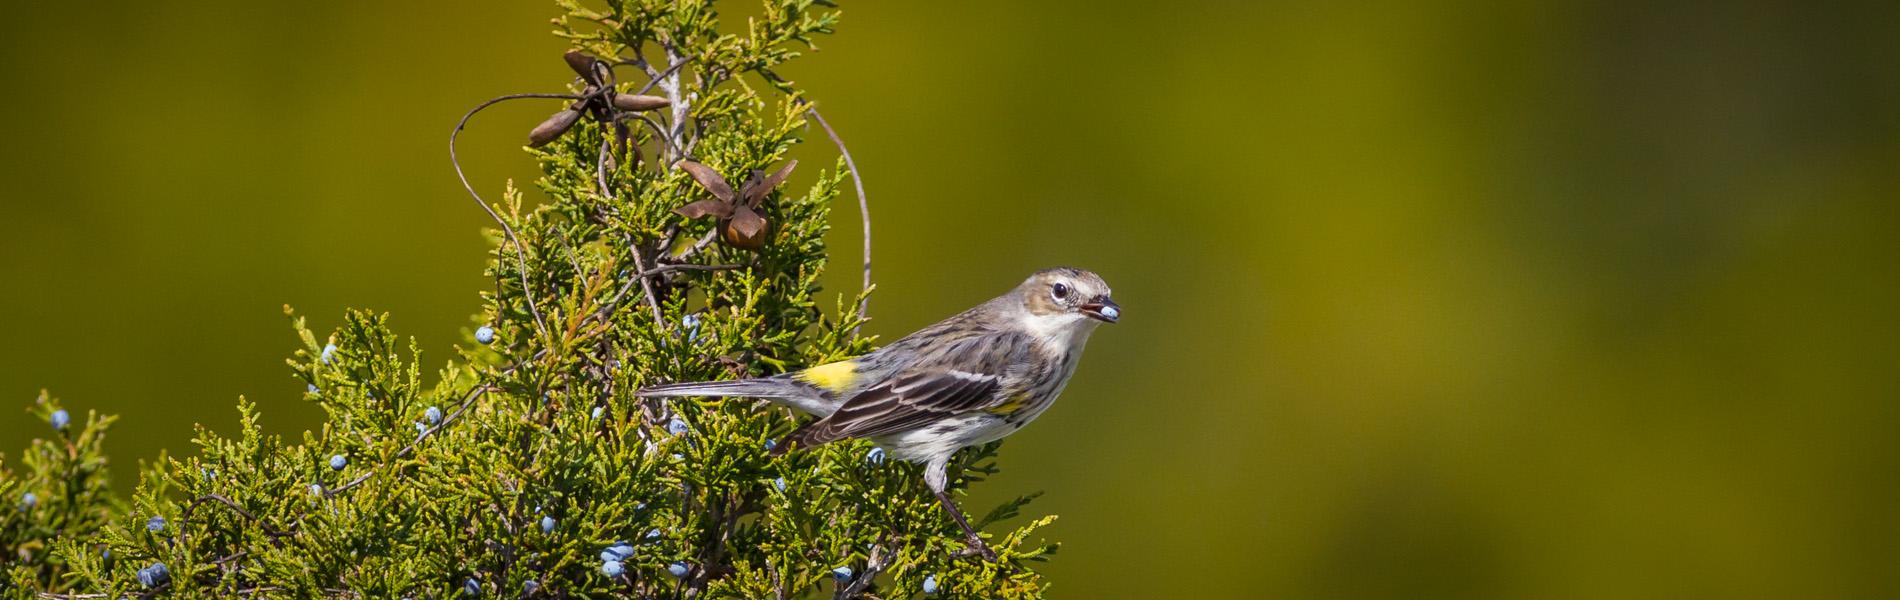 Cedar Key birds